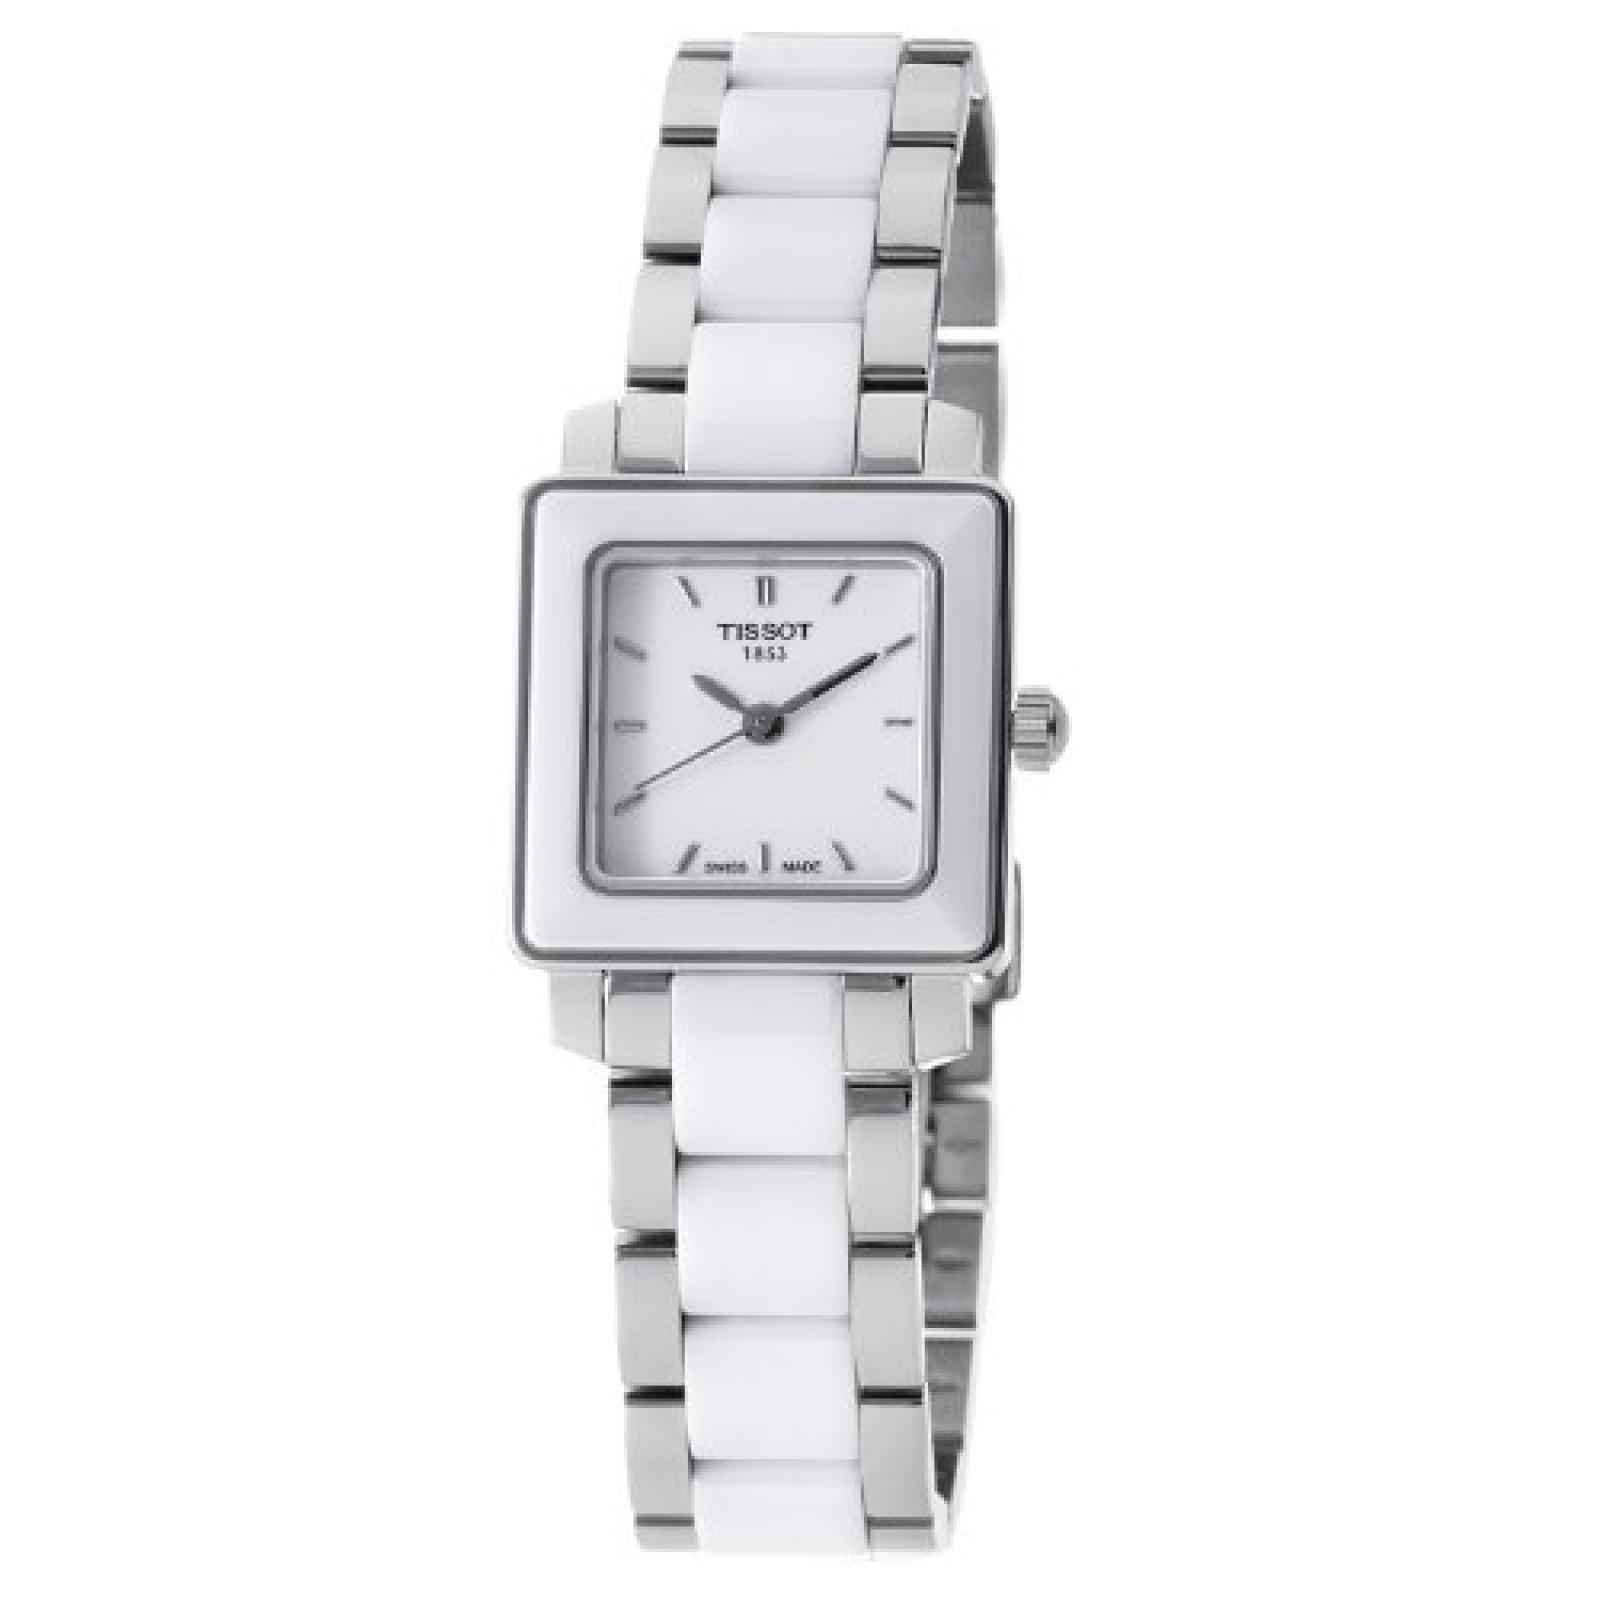 Tissot Damen-Armbanduhr Ceramic Analog Quarz Keramik T064.310.22.011.00